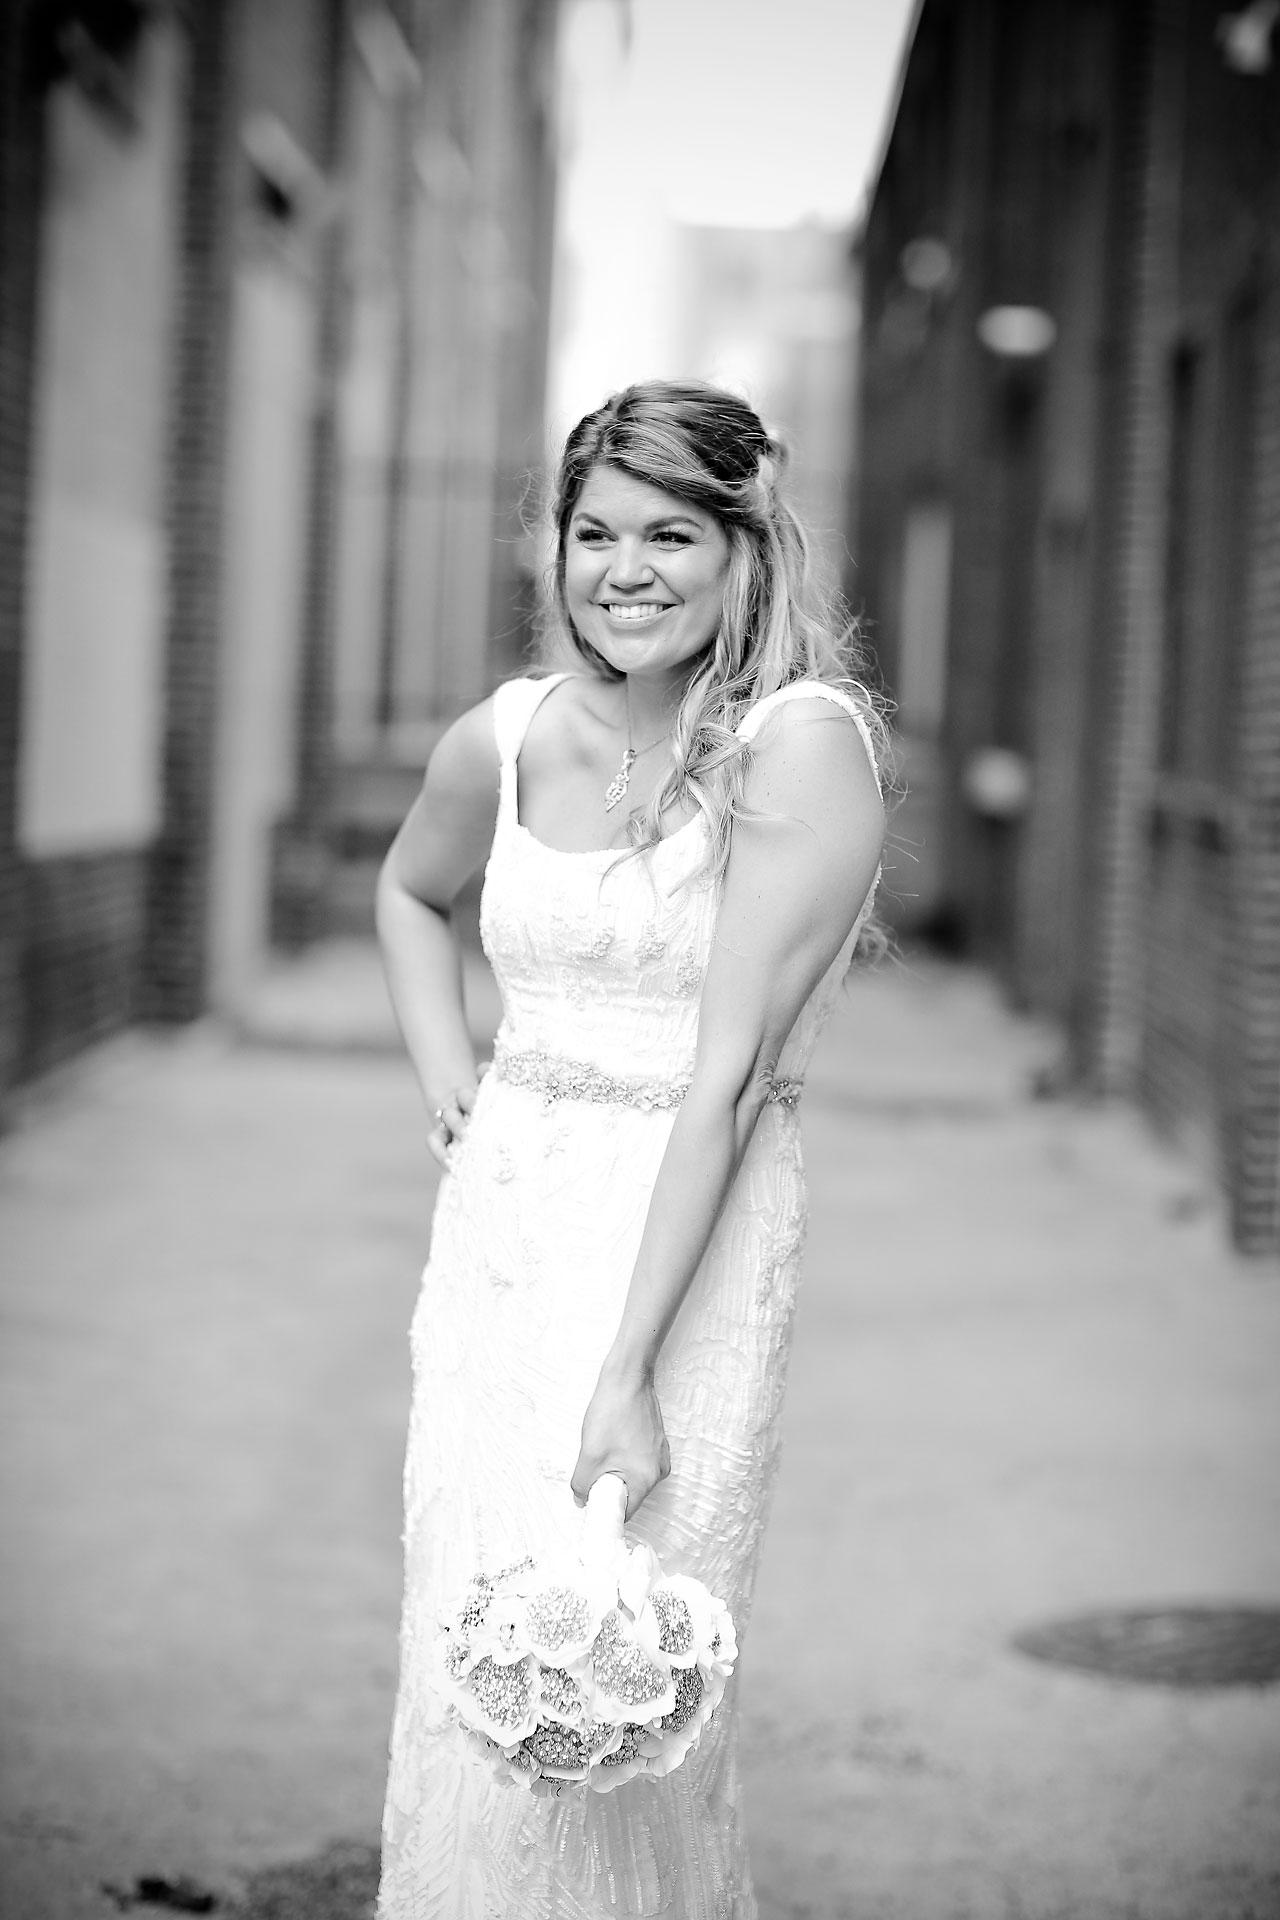 Amy Nick Canal 337 Wedding 133